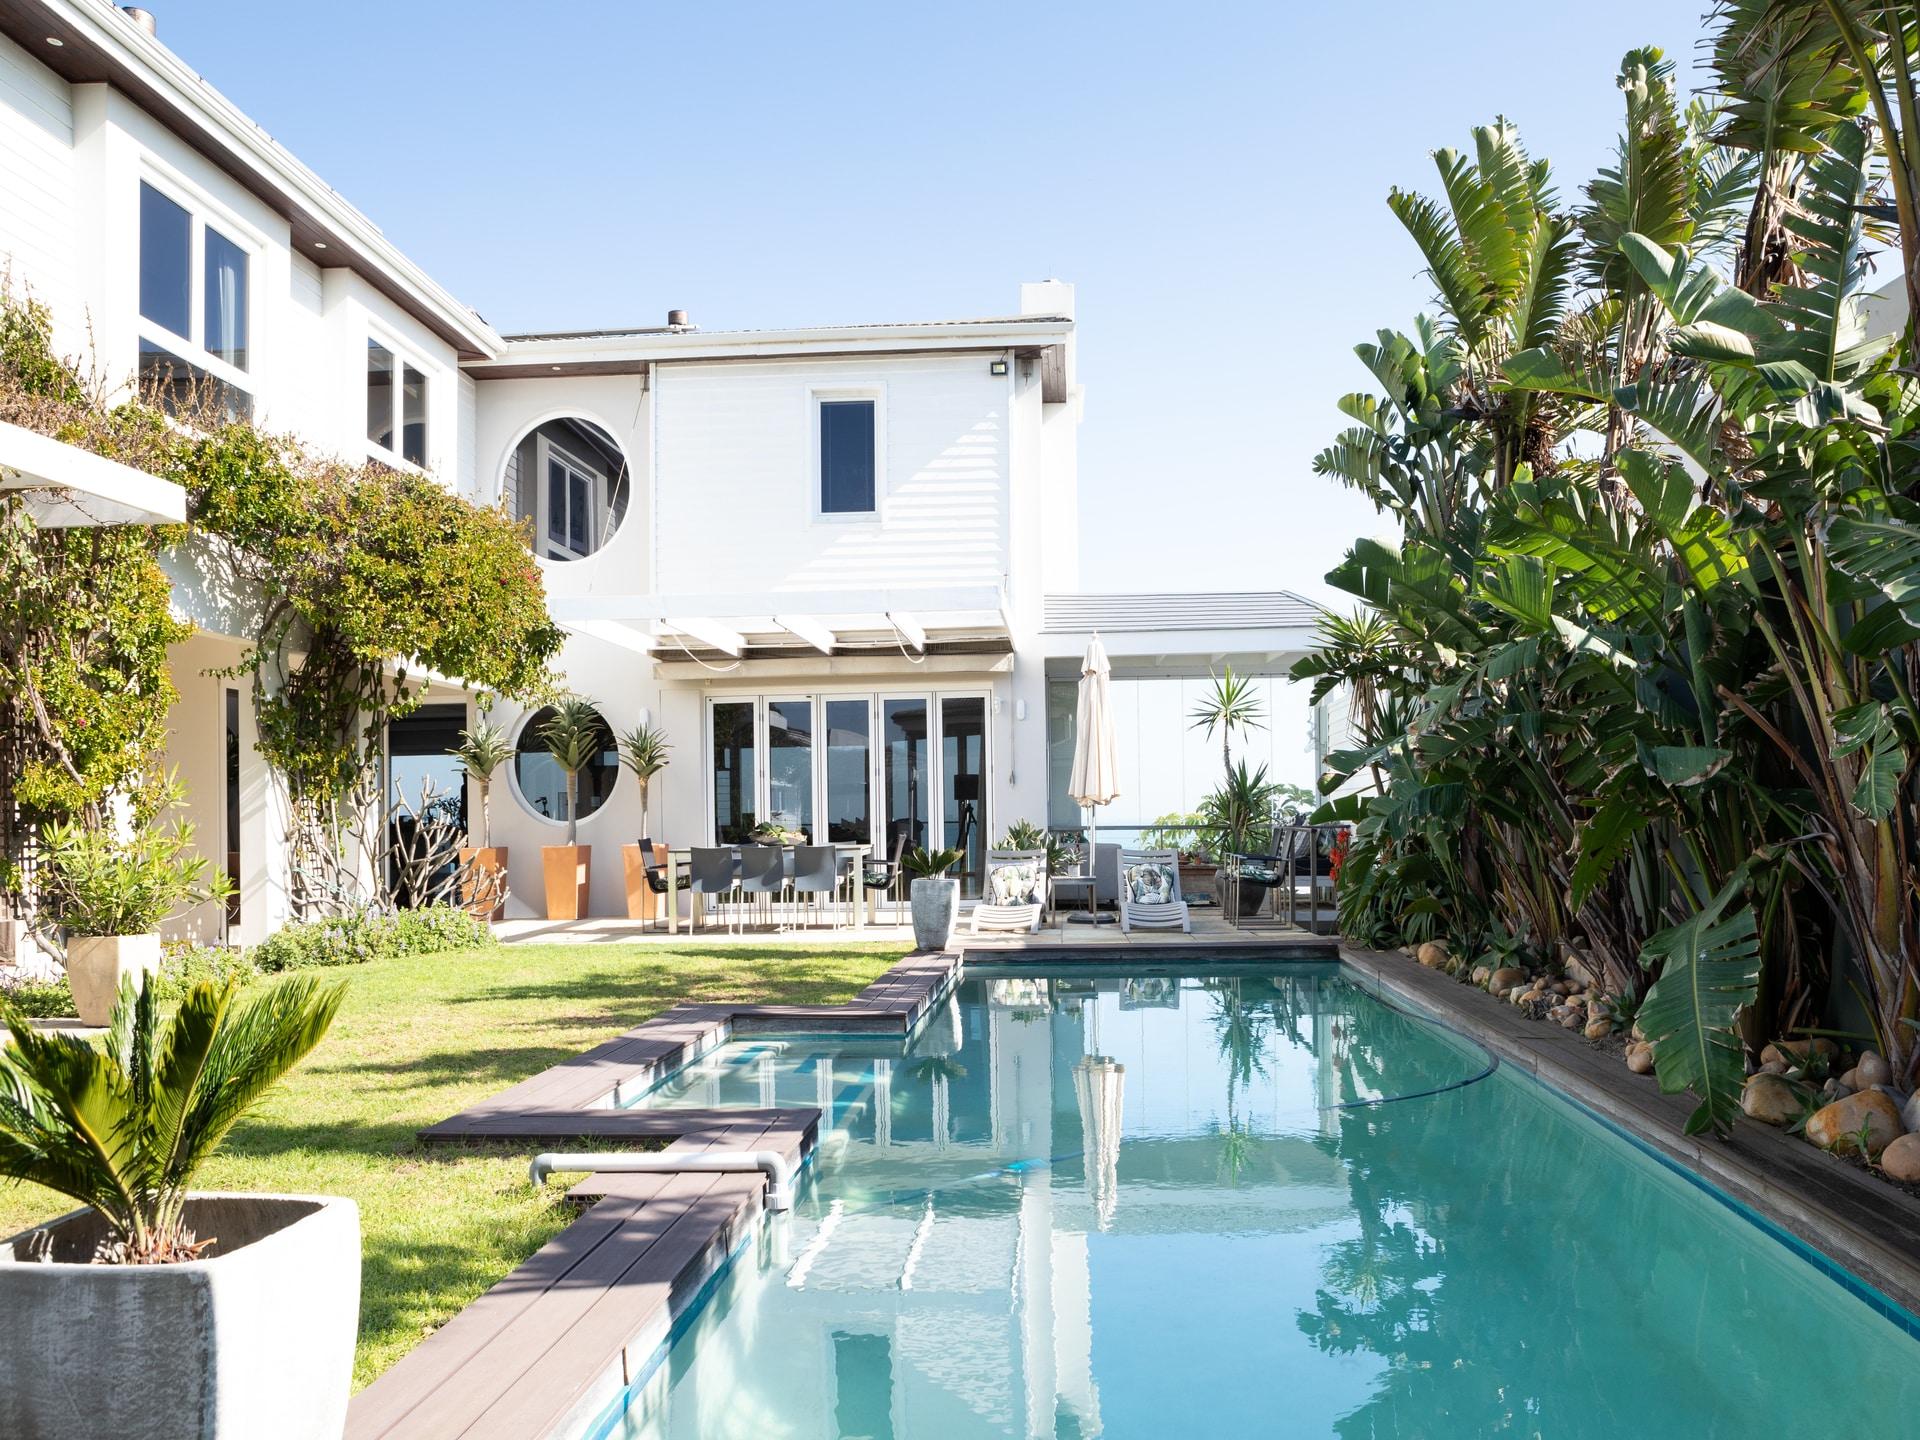 outdoor living swimming pool white retro house lush green garden